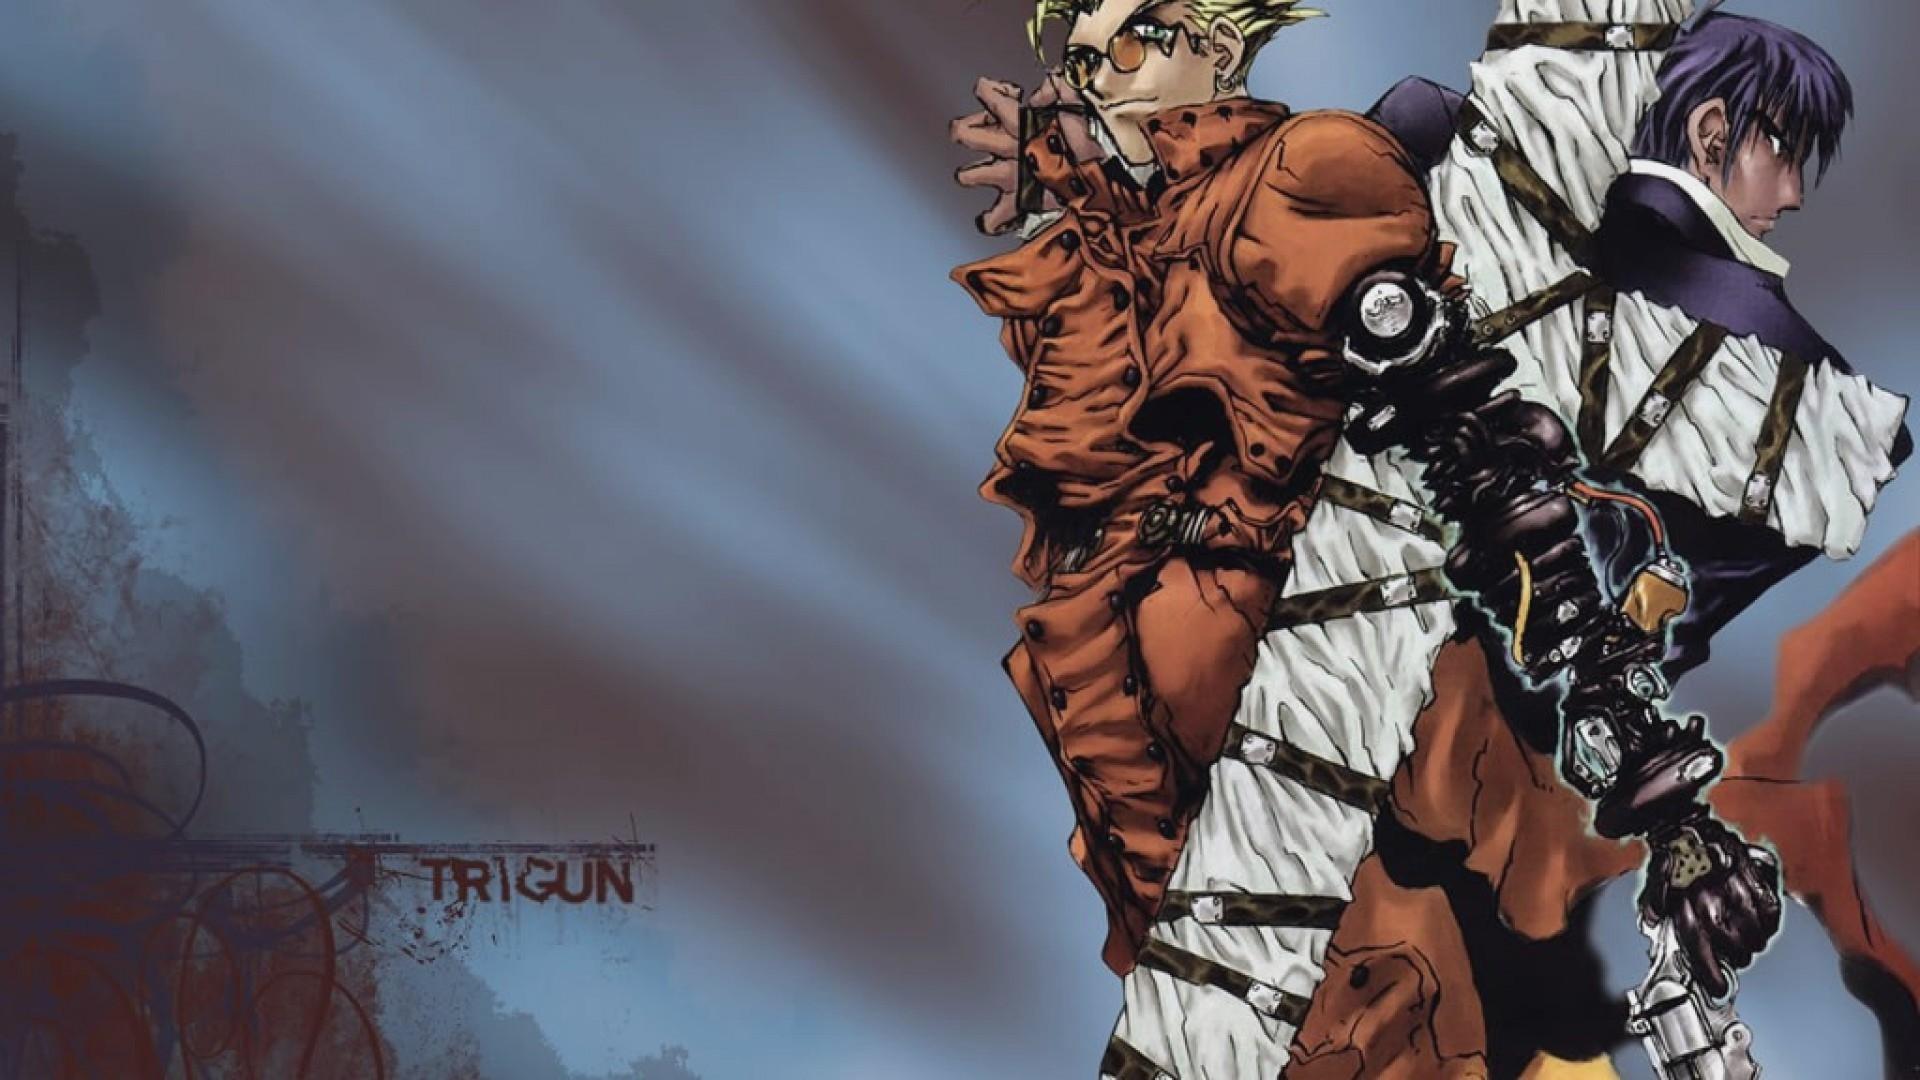 Trigun new wallpaper